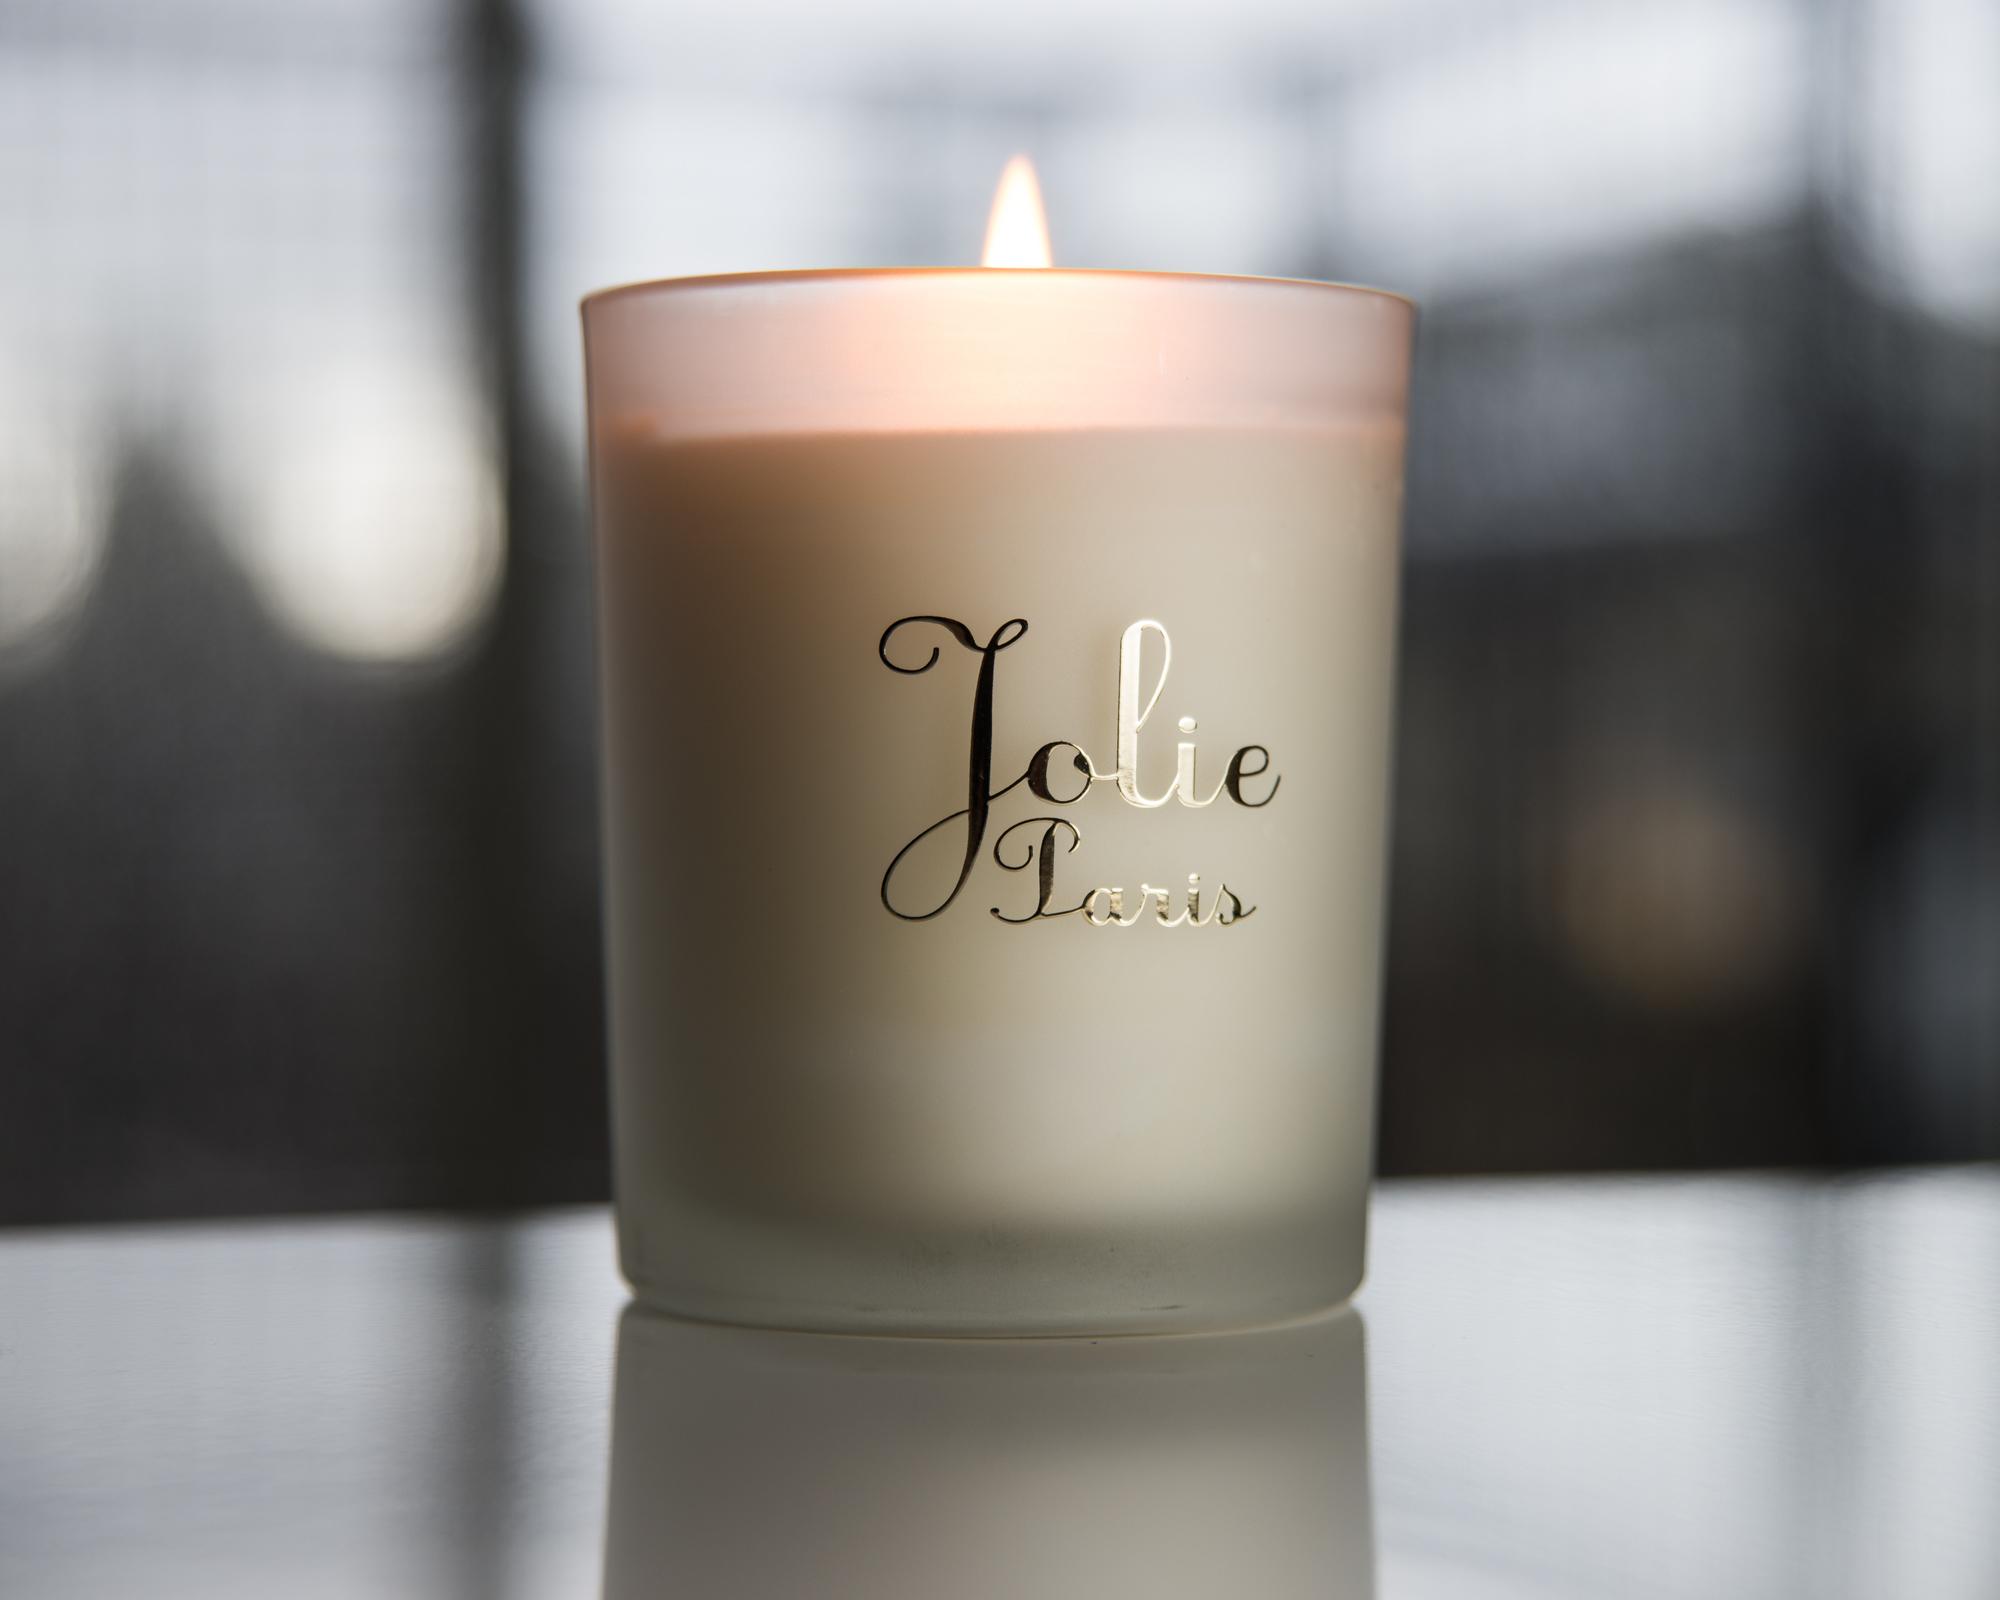 Jolie.Small.4.jpg